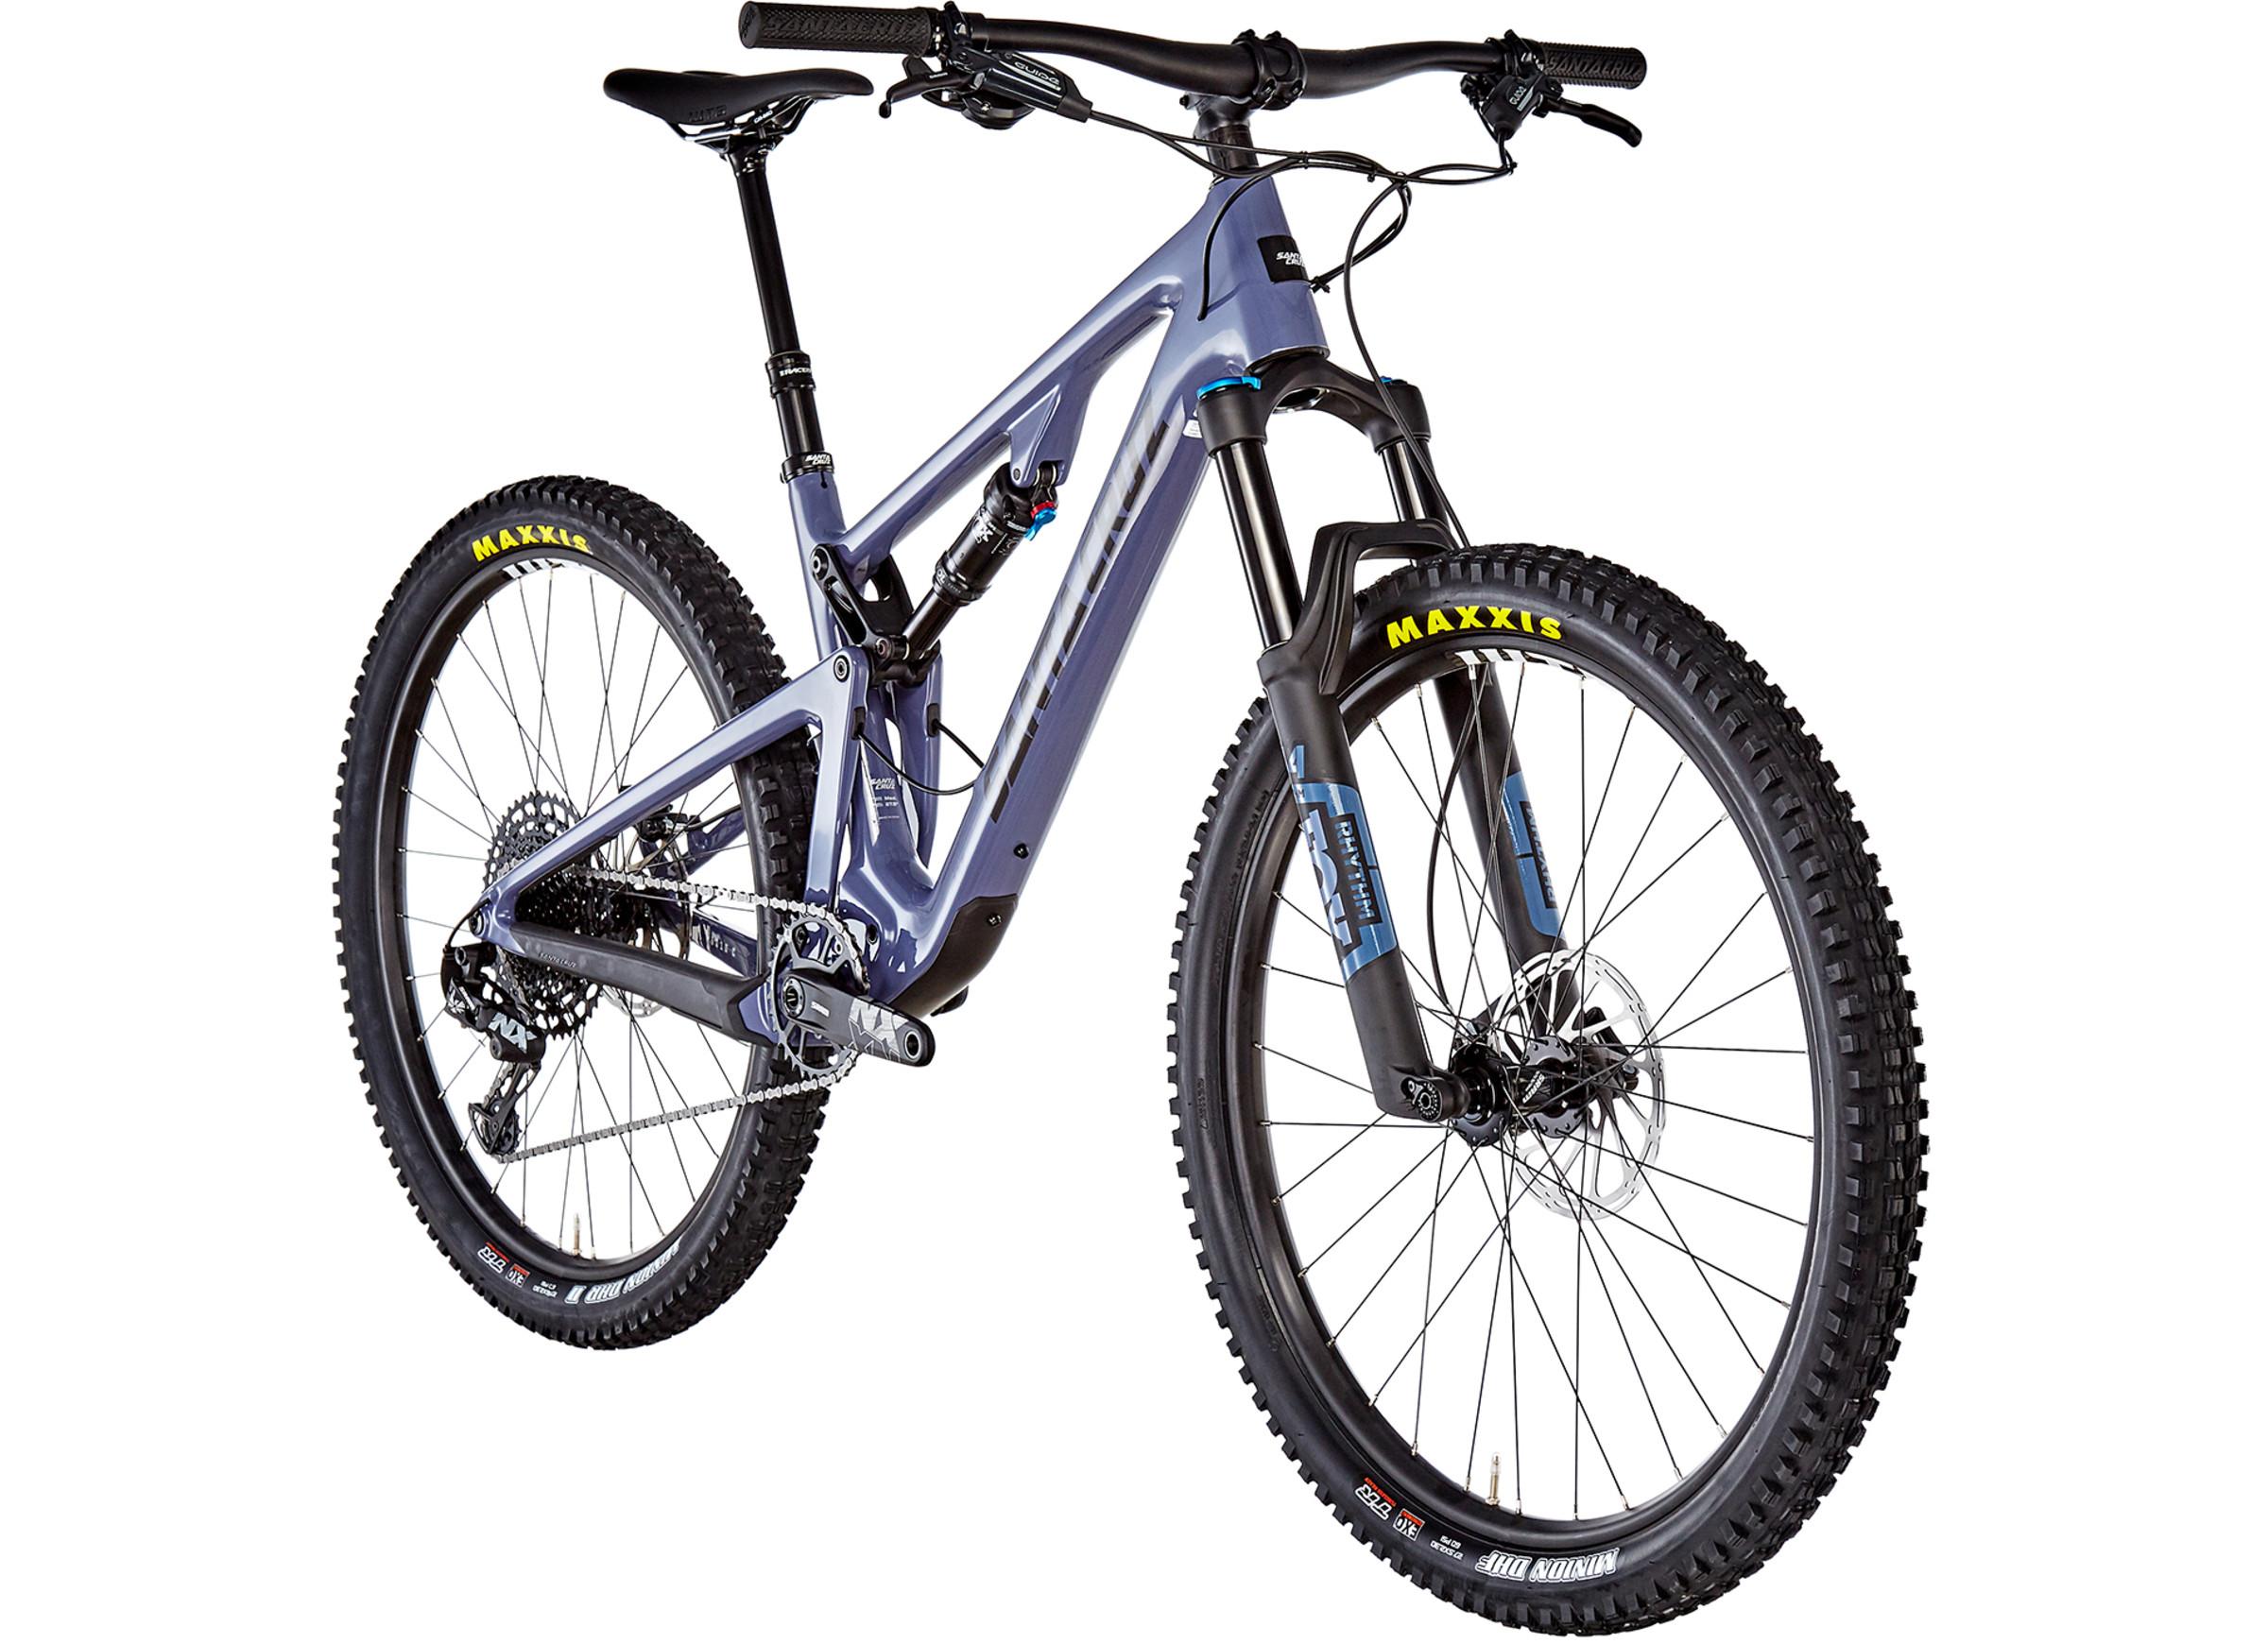 "MTB Santa Cruz 5010 3 C R-Kit purple 27""5 (Carbon, Eagle NX) - 2019 (S, L)"